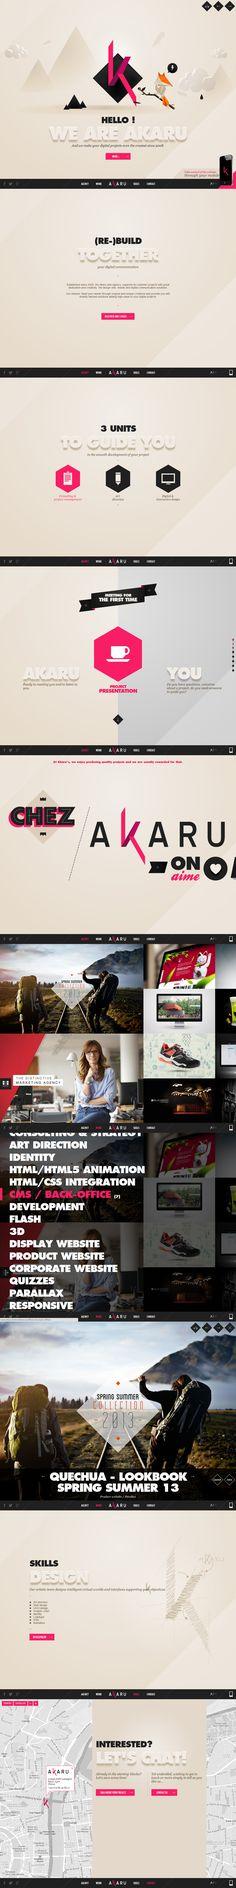 Akaru Agency from France http://www.akaru.fr/